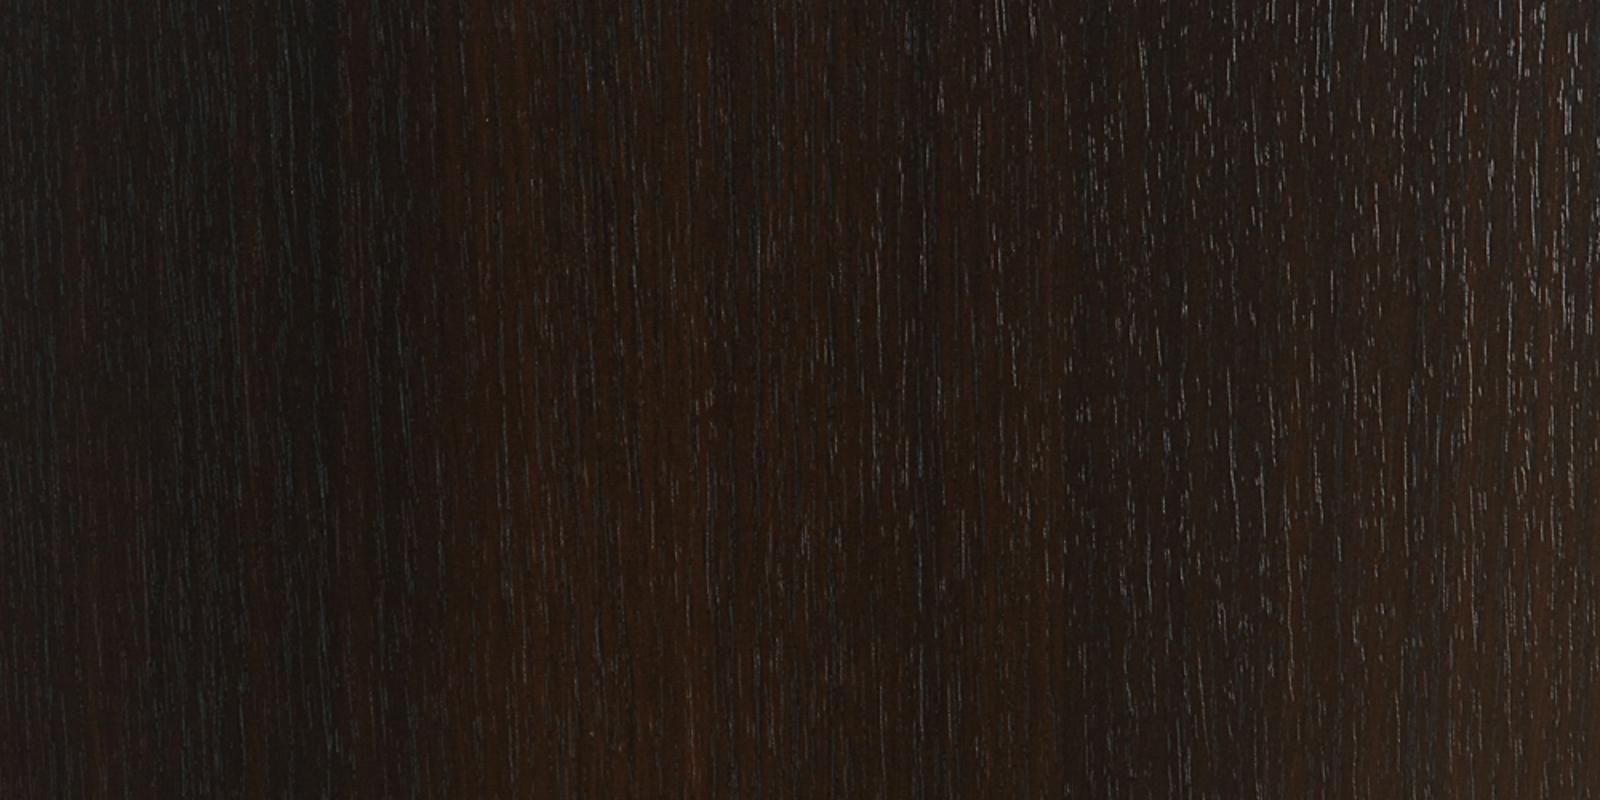 Комод Невада 103/84 см (дуб феррара/дуб кремона)